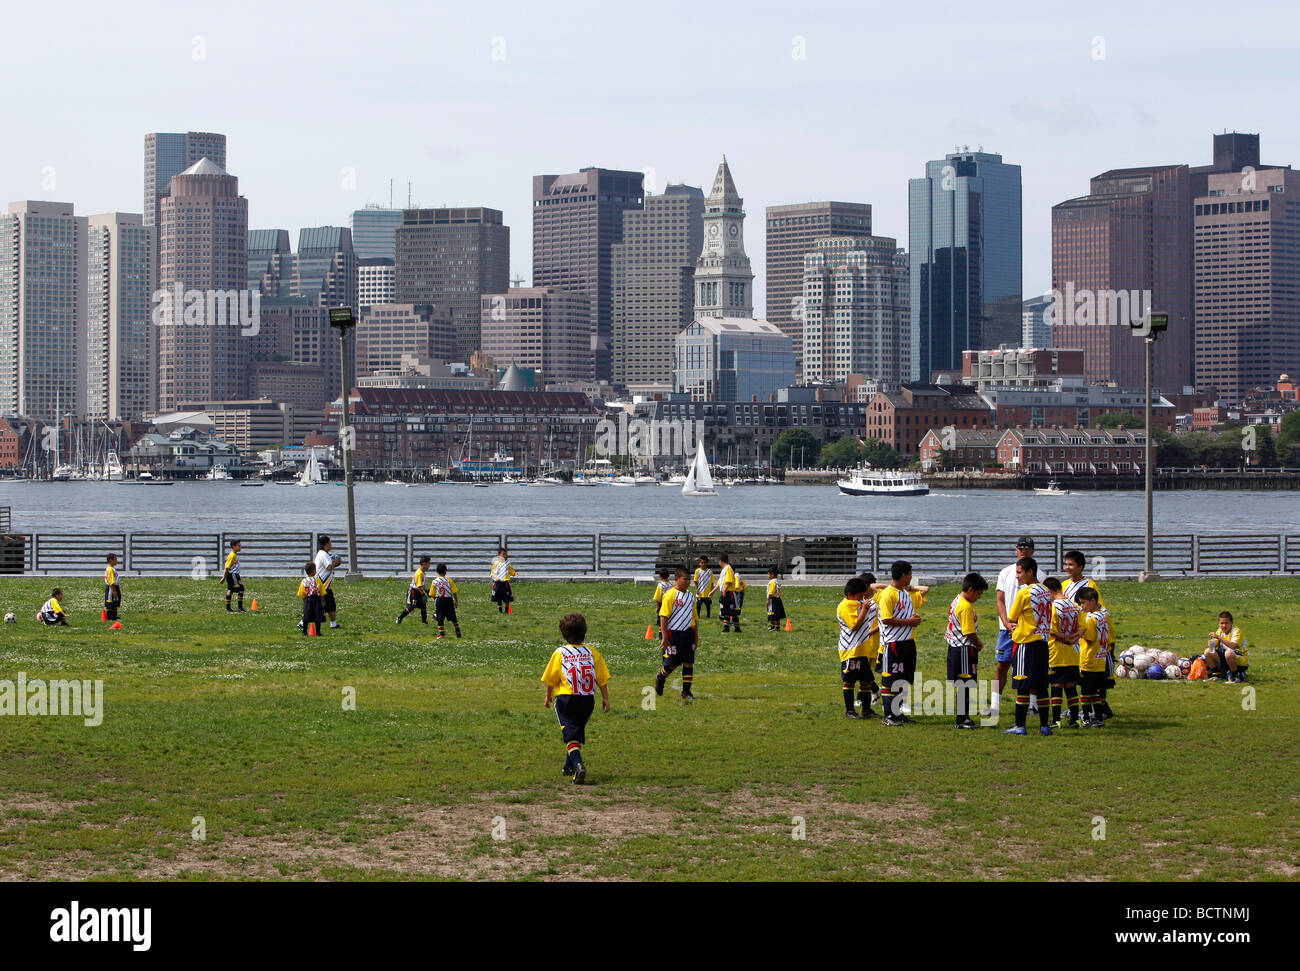 Children and soccer practice, LoPresti Park, East Boston - Stock Image